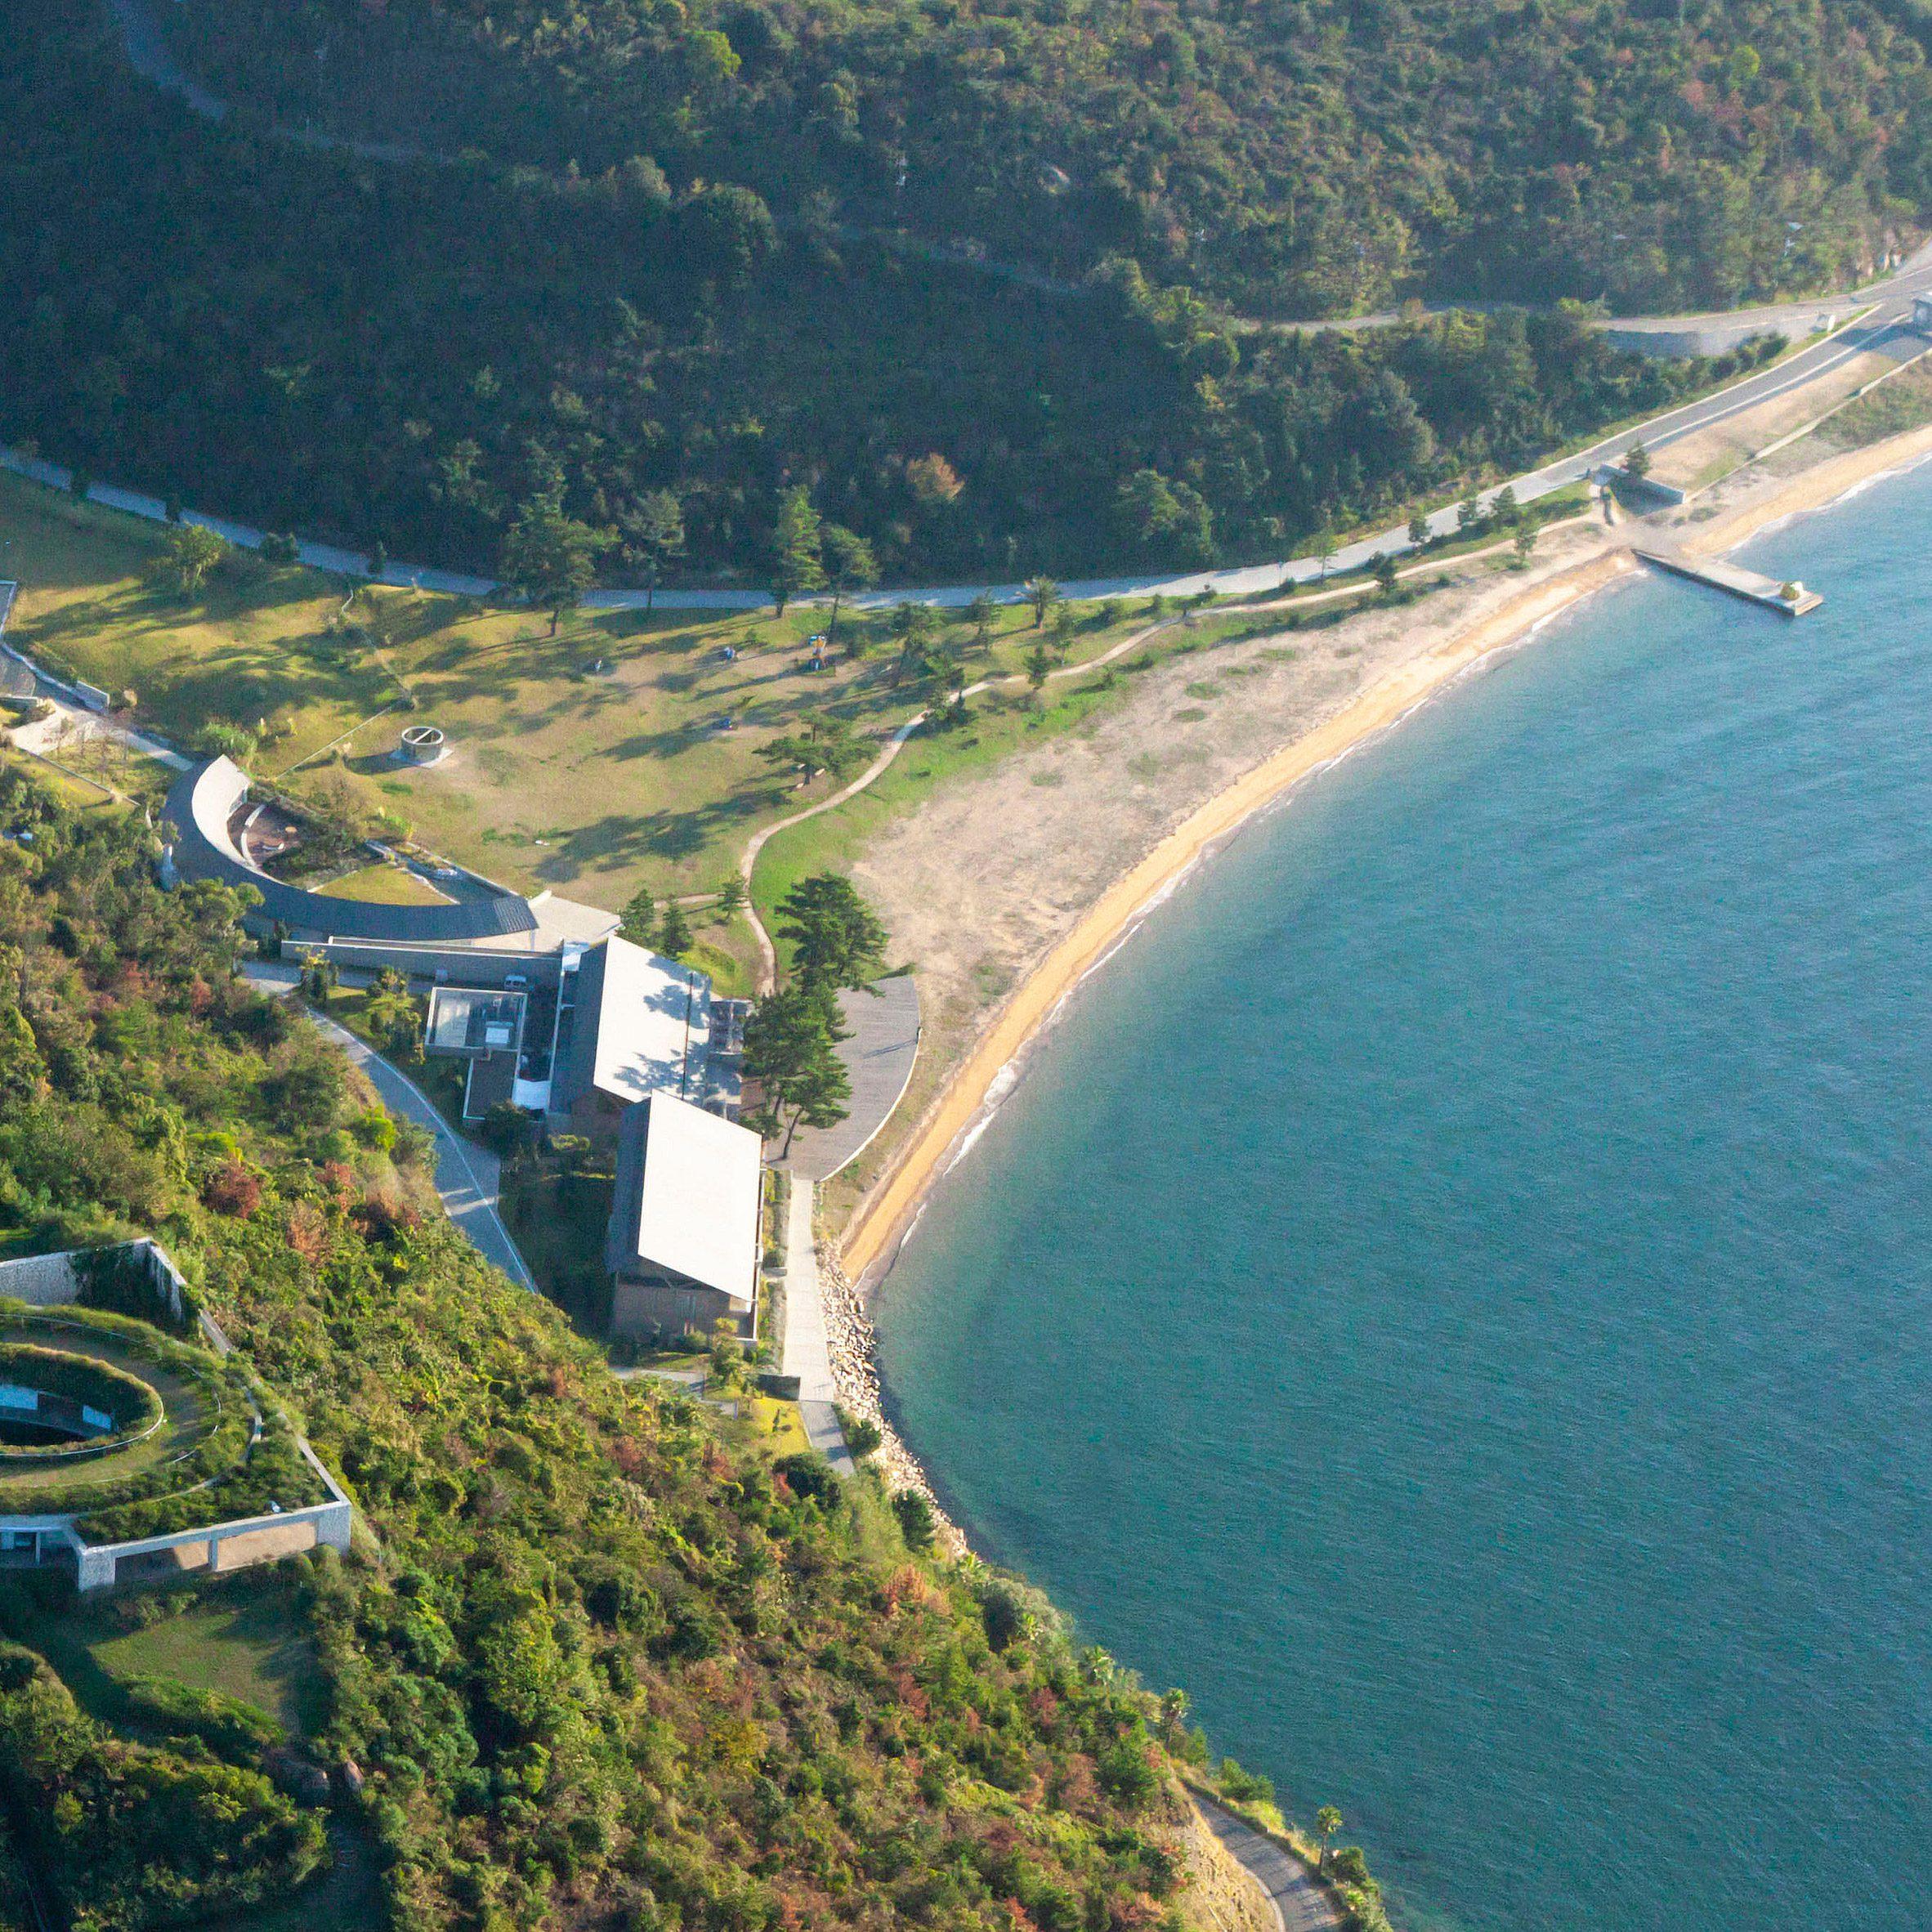 An aerial view of Seto Inland Sea and Naoshima Island